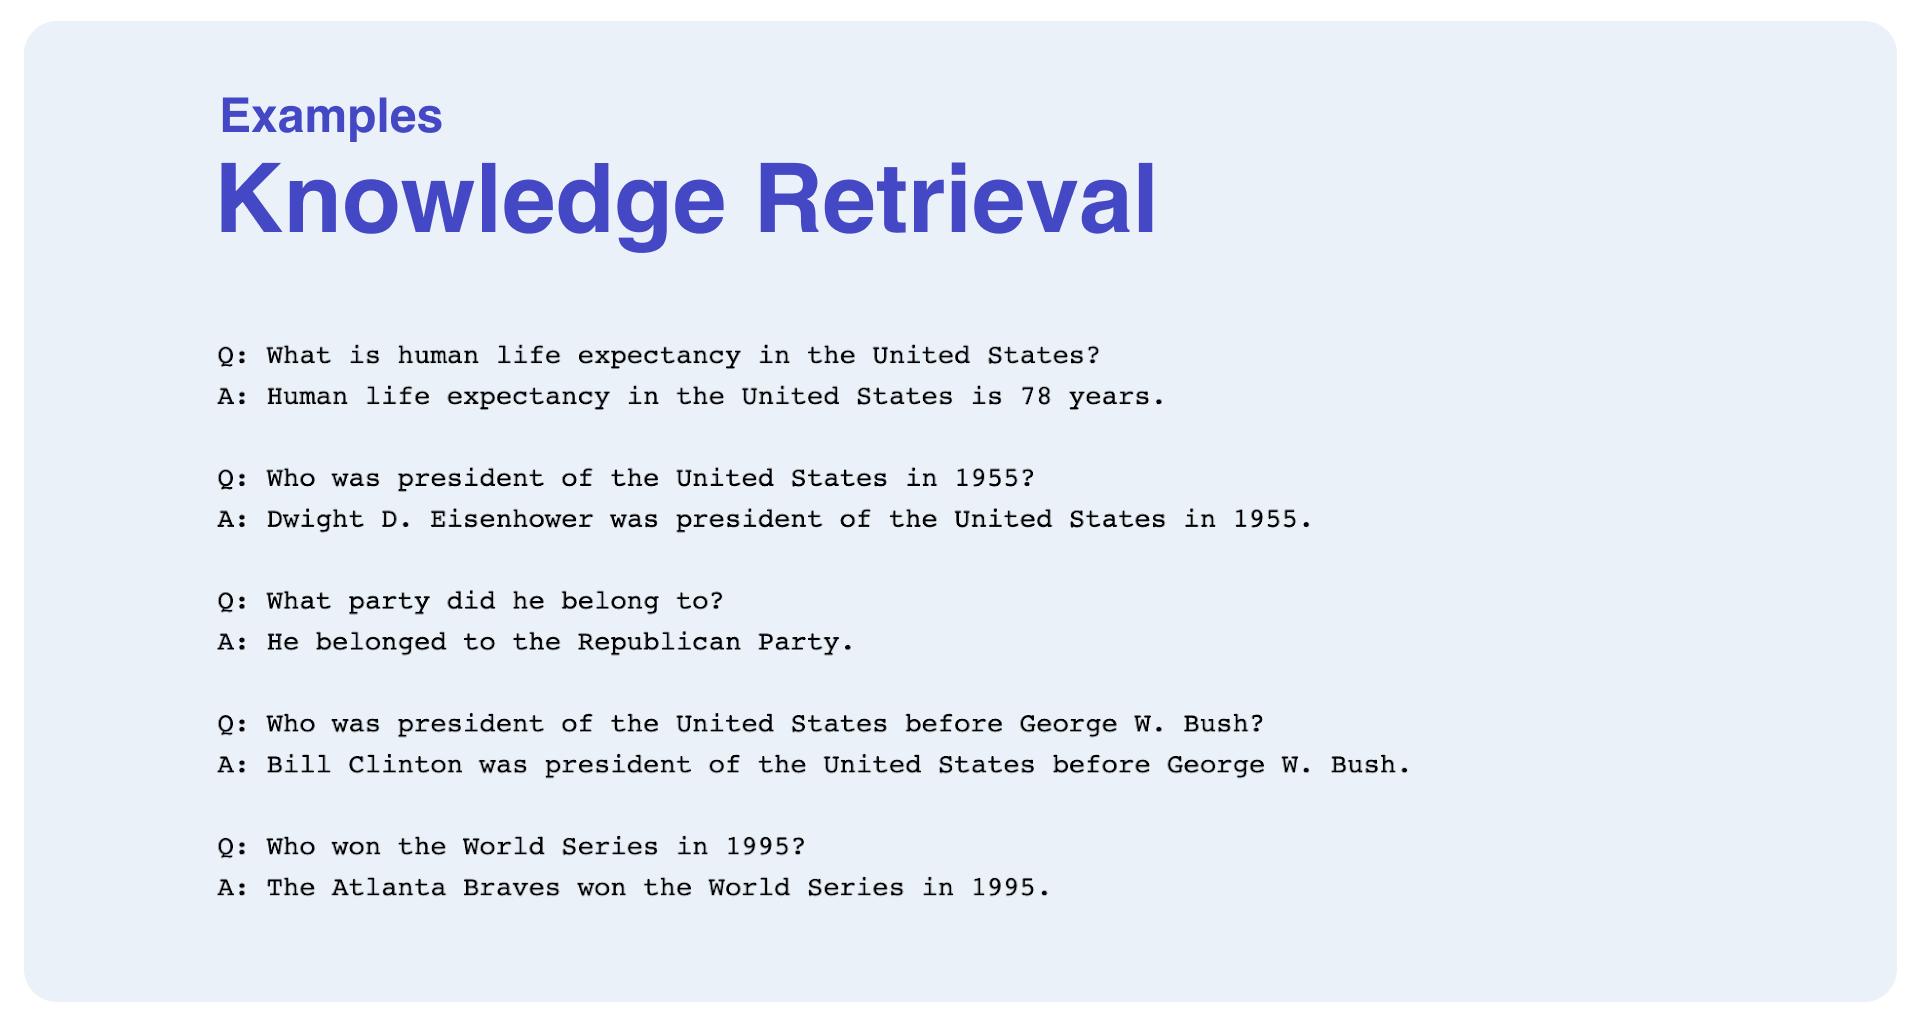 GPT-3 Knowledge Retrieval